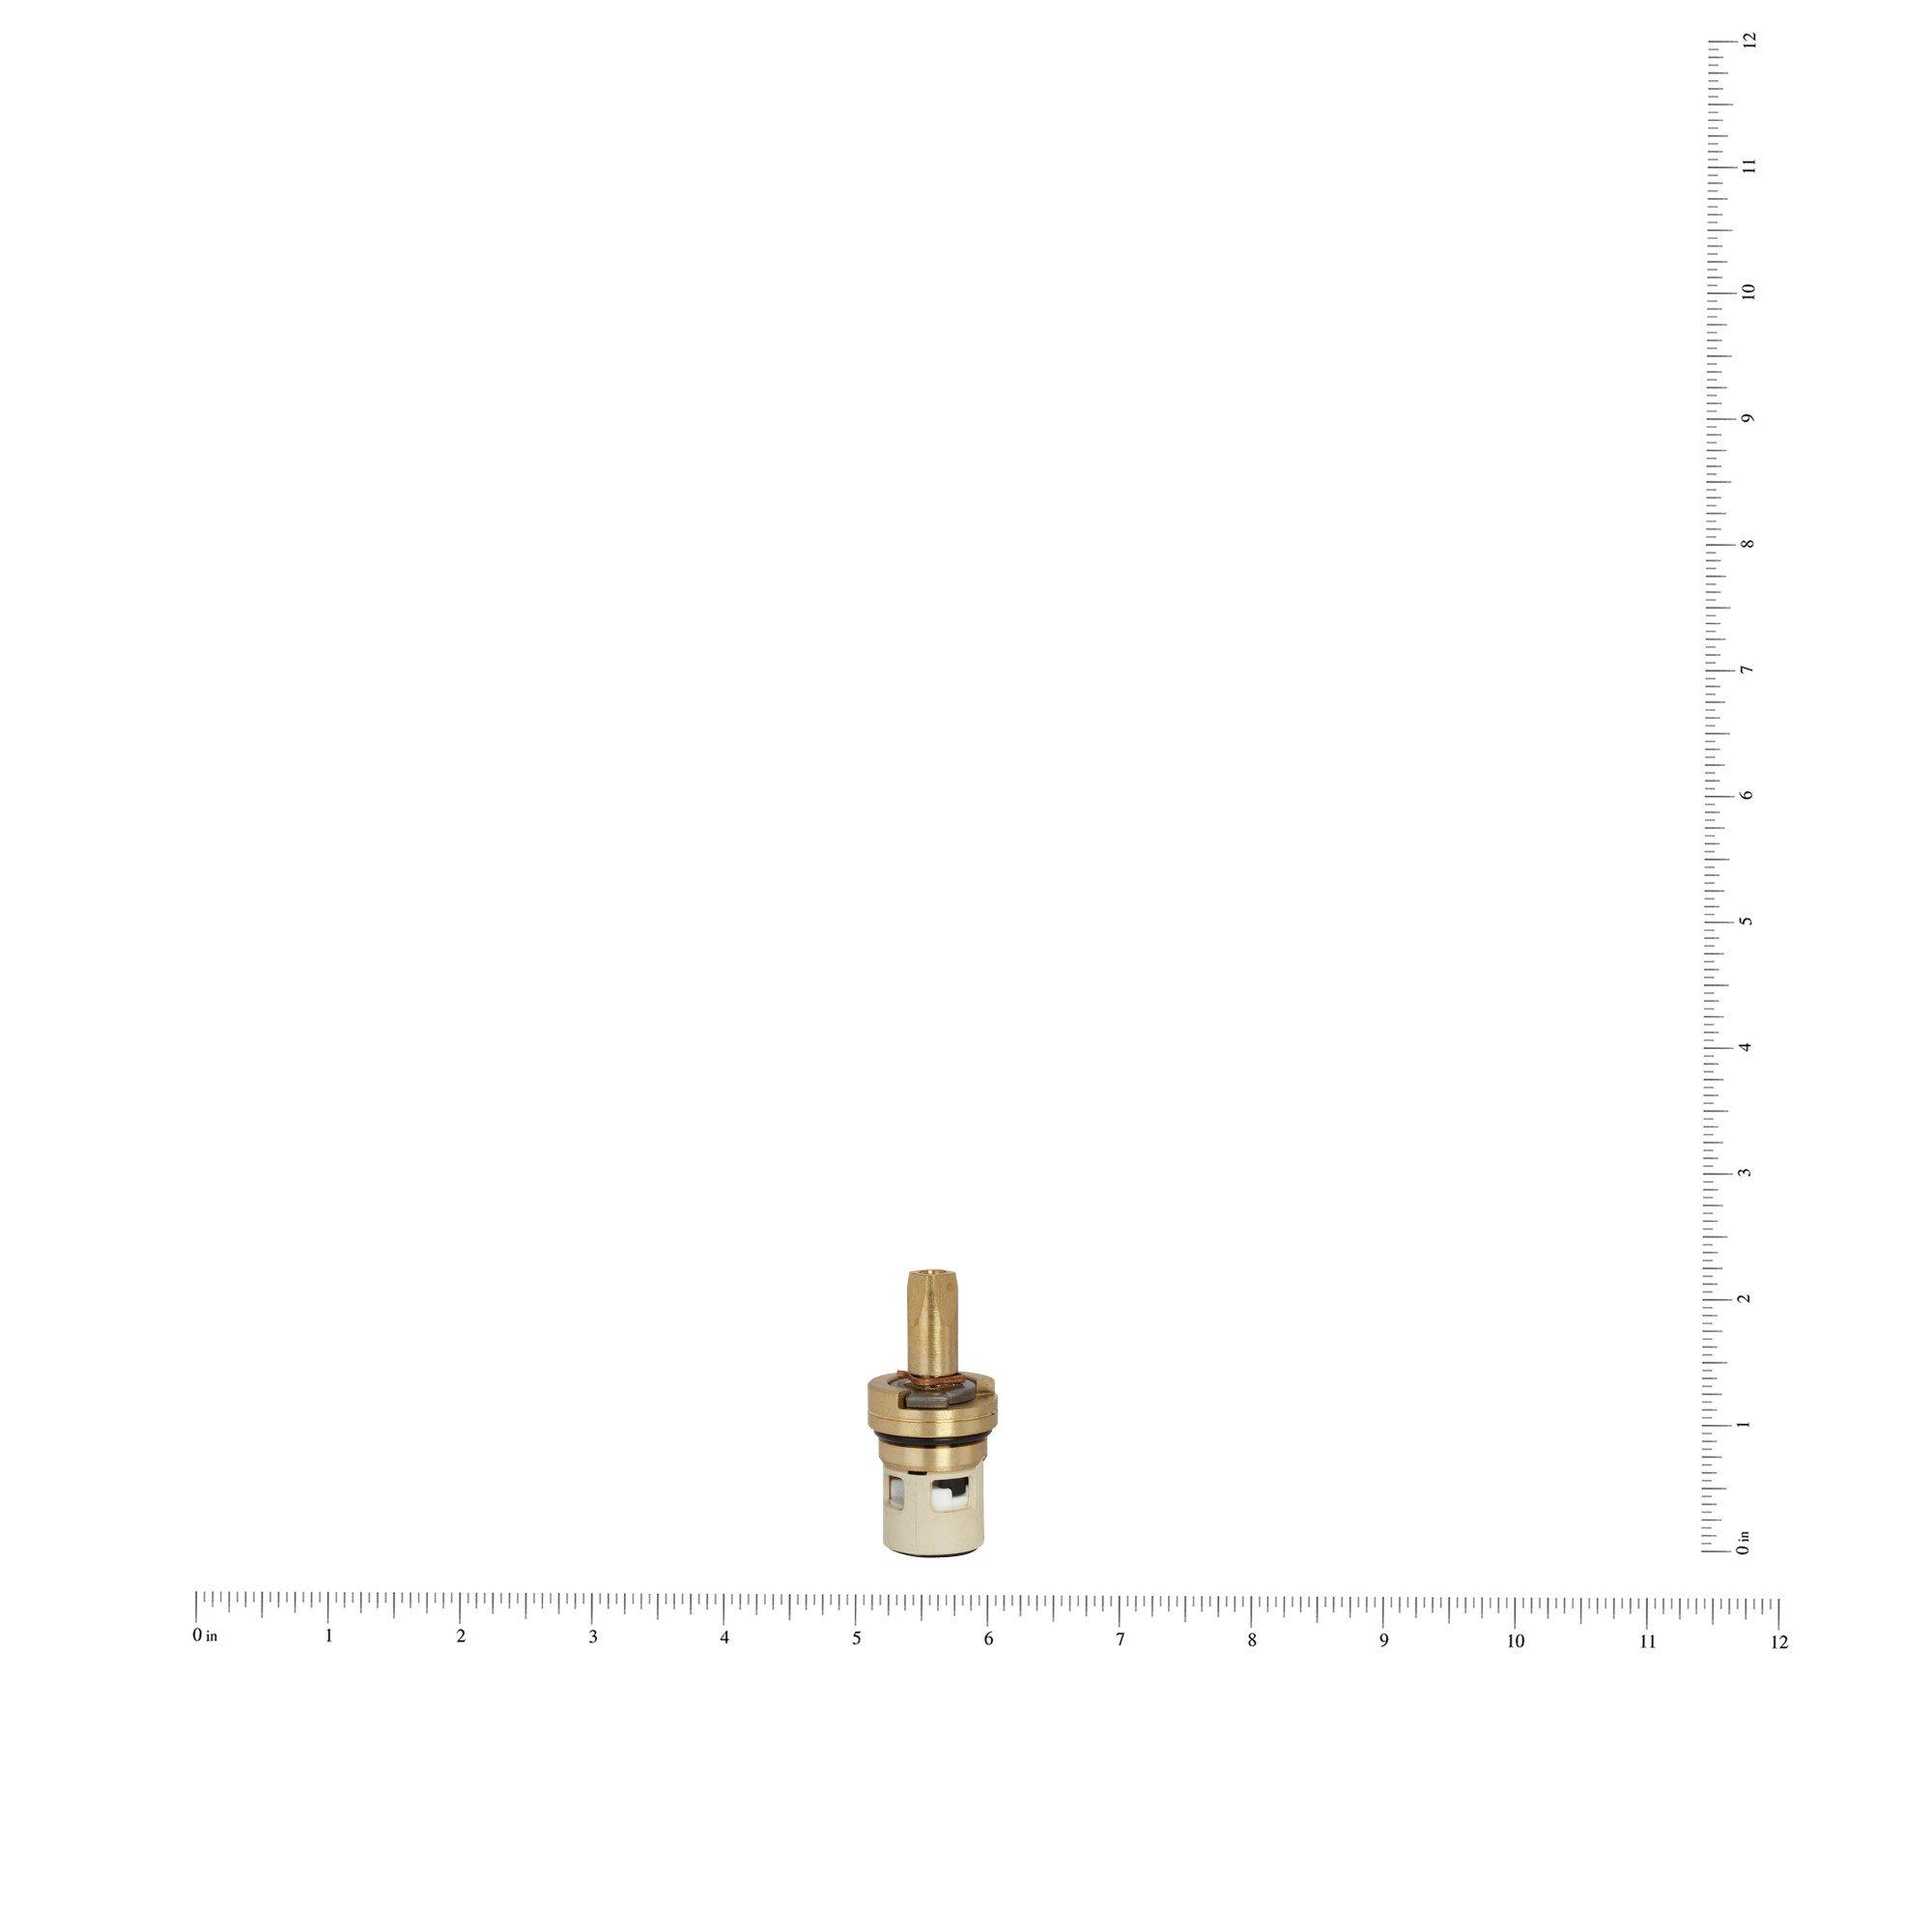 American Standard 951764-0070A Cartridge